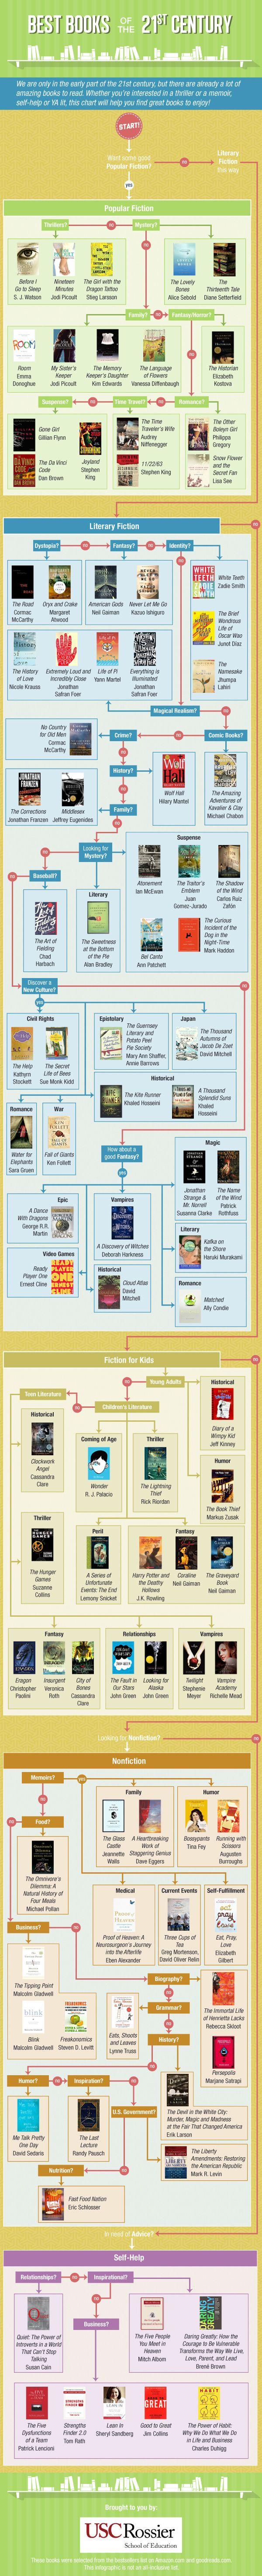 Los mejores libros del siglo XXI #infografia #infographic